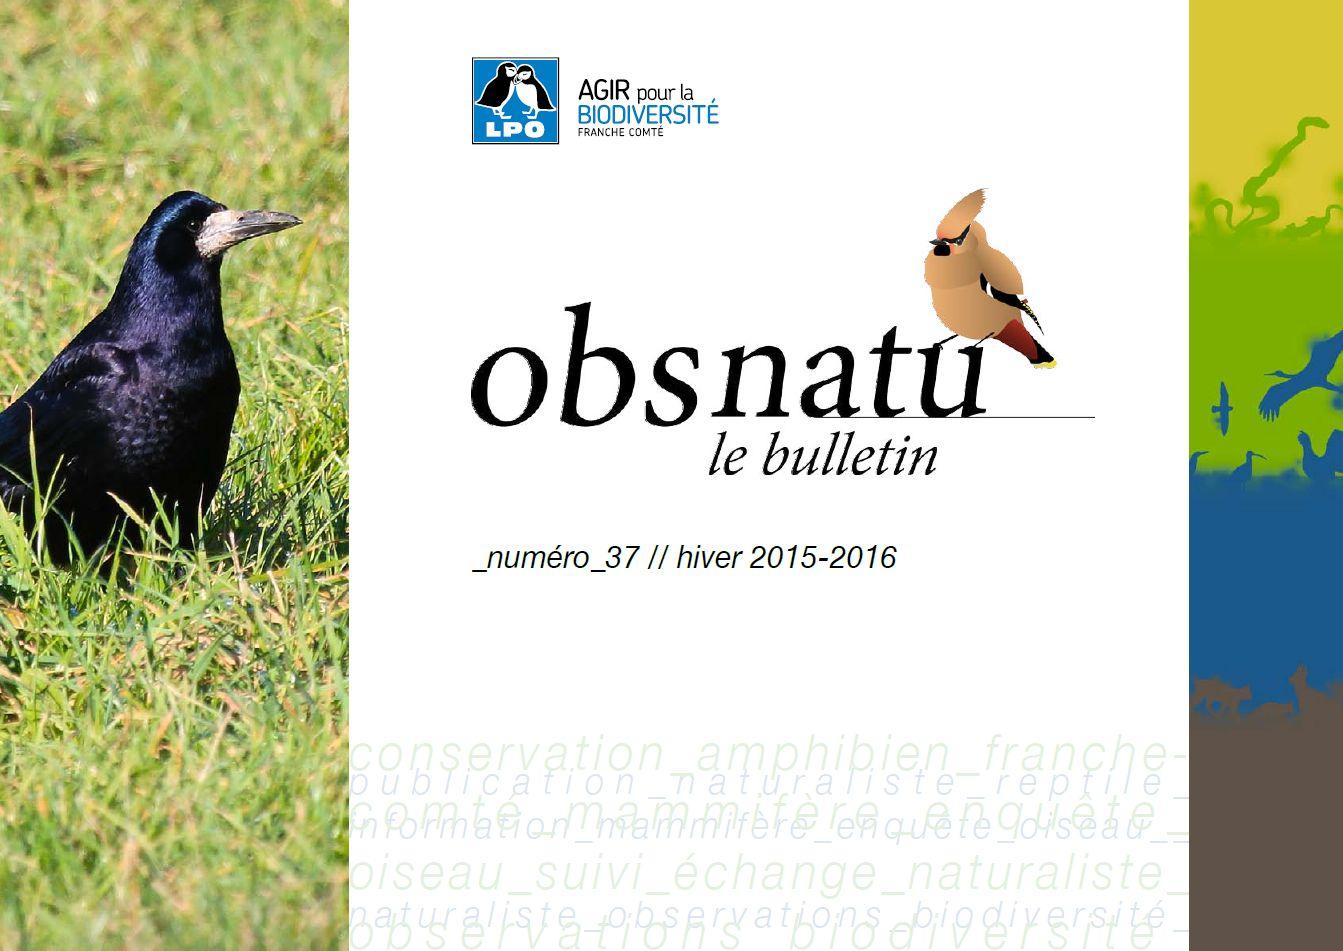 https://cdnfiles2.biolovision.net/franche-comte.lpo.fr/userfiles/publications/Obsnatubulls/Obsnatun37hiv2015couv.jpg